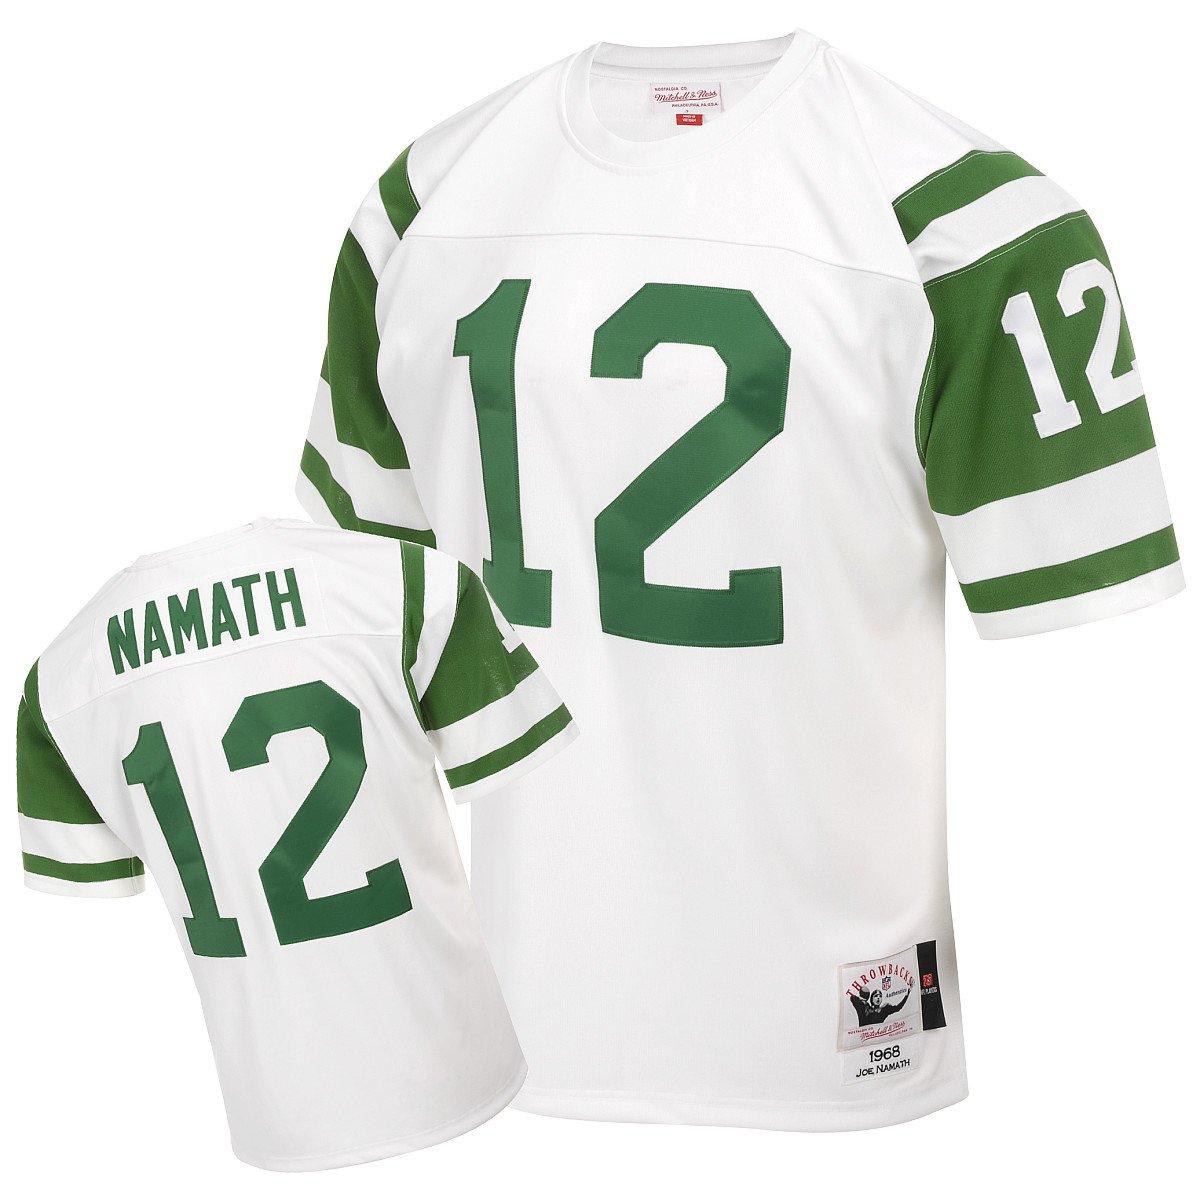 ... Amazon.com Mitchell Ness New York Jets 1968 Joe Namath Authentic  Throwback White Jersey Size ... 550a92ebd